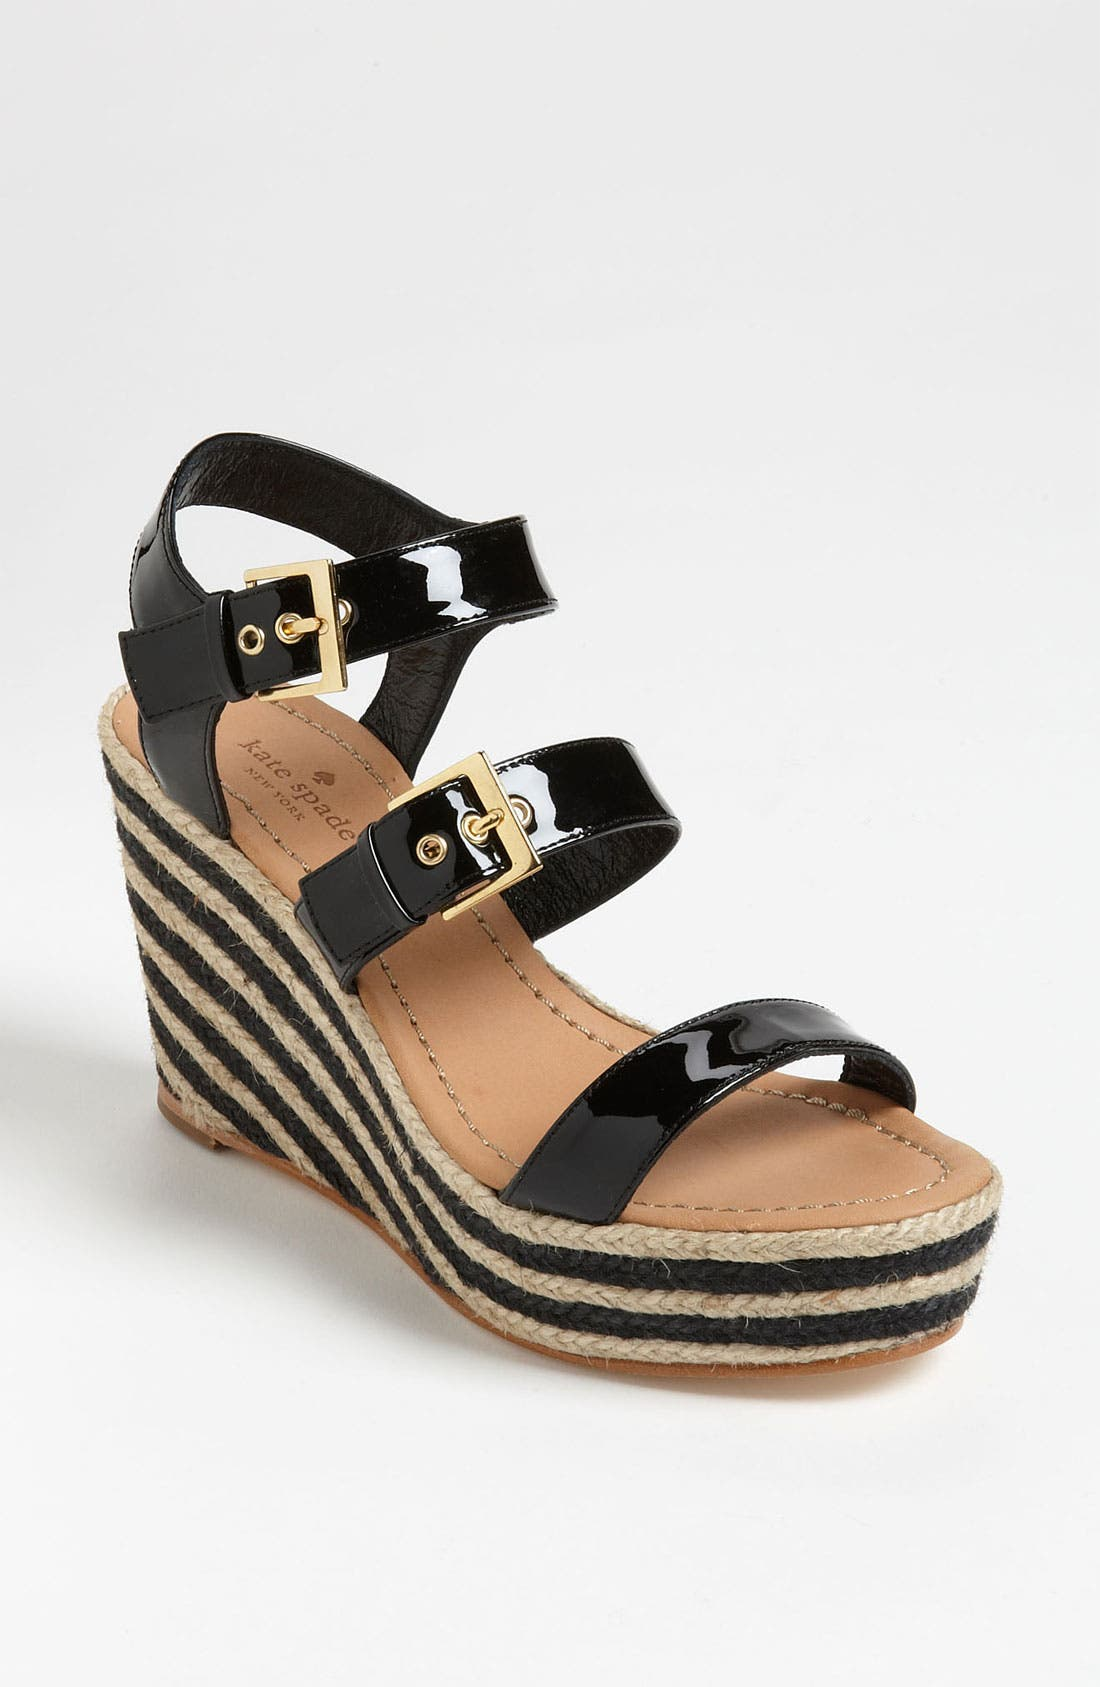 KATE SPADE NEW YORK 'darla' sandal, Main, color, 001